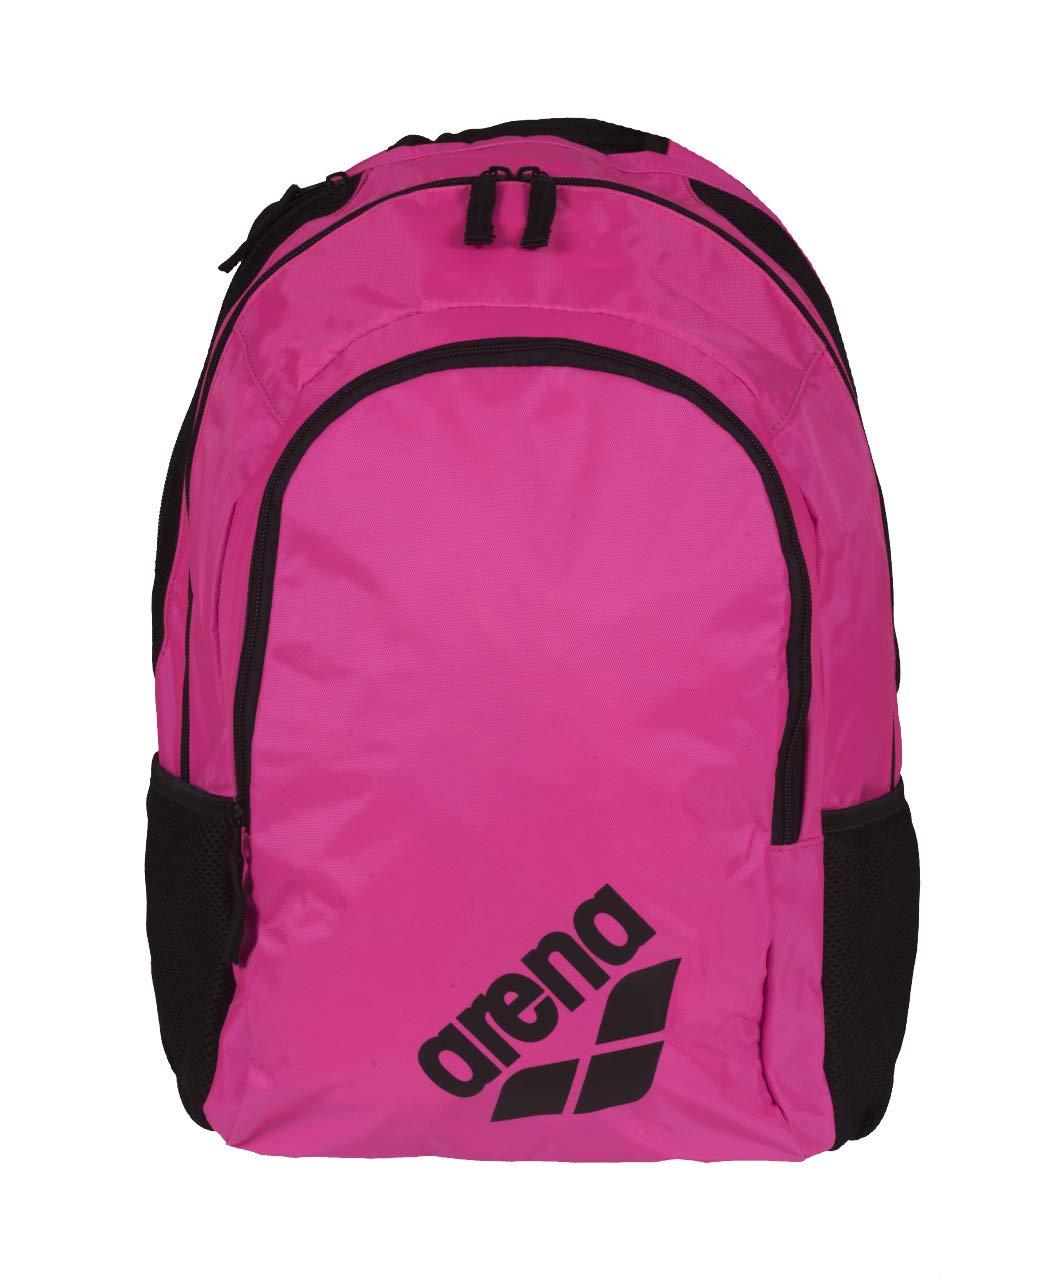 arena Spiky 2 Swim Backpack, Fuchsia